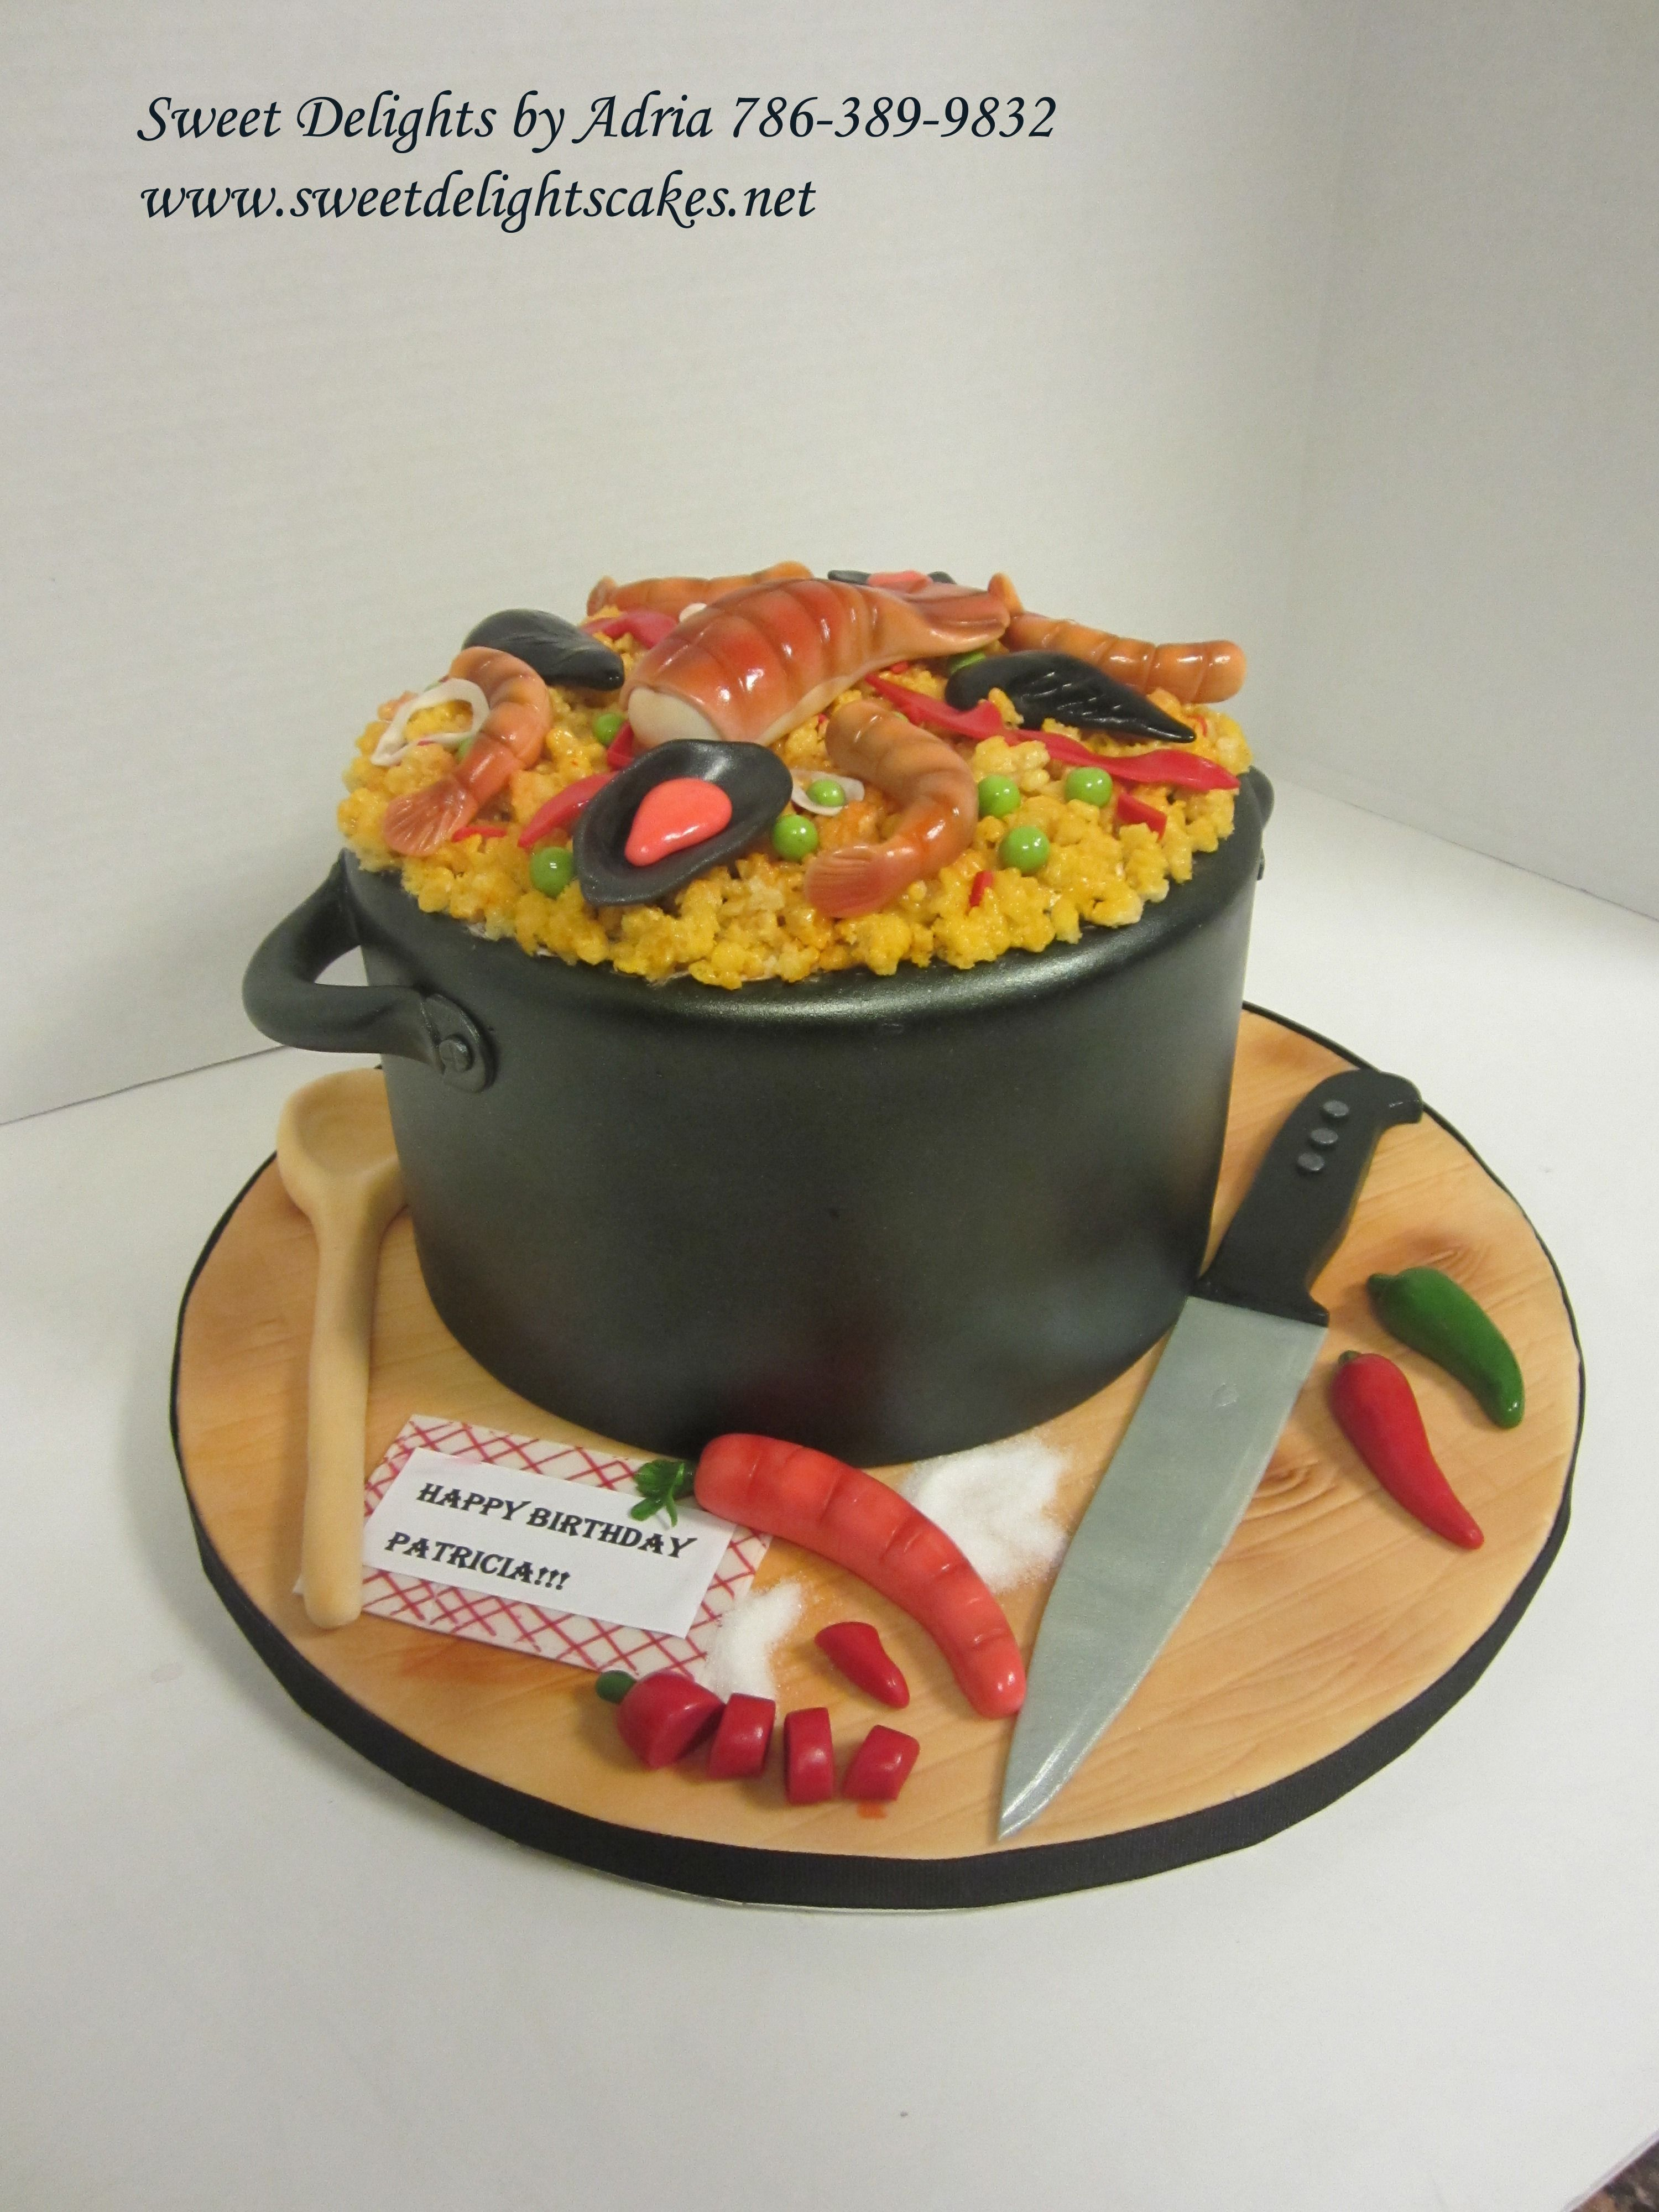 Paella birhday cake Sweet delights, Birhday cake, Custom